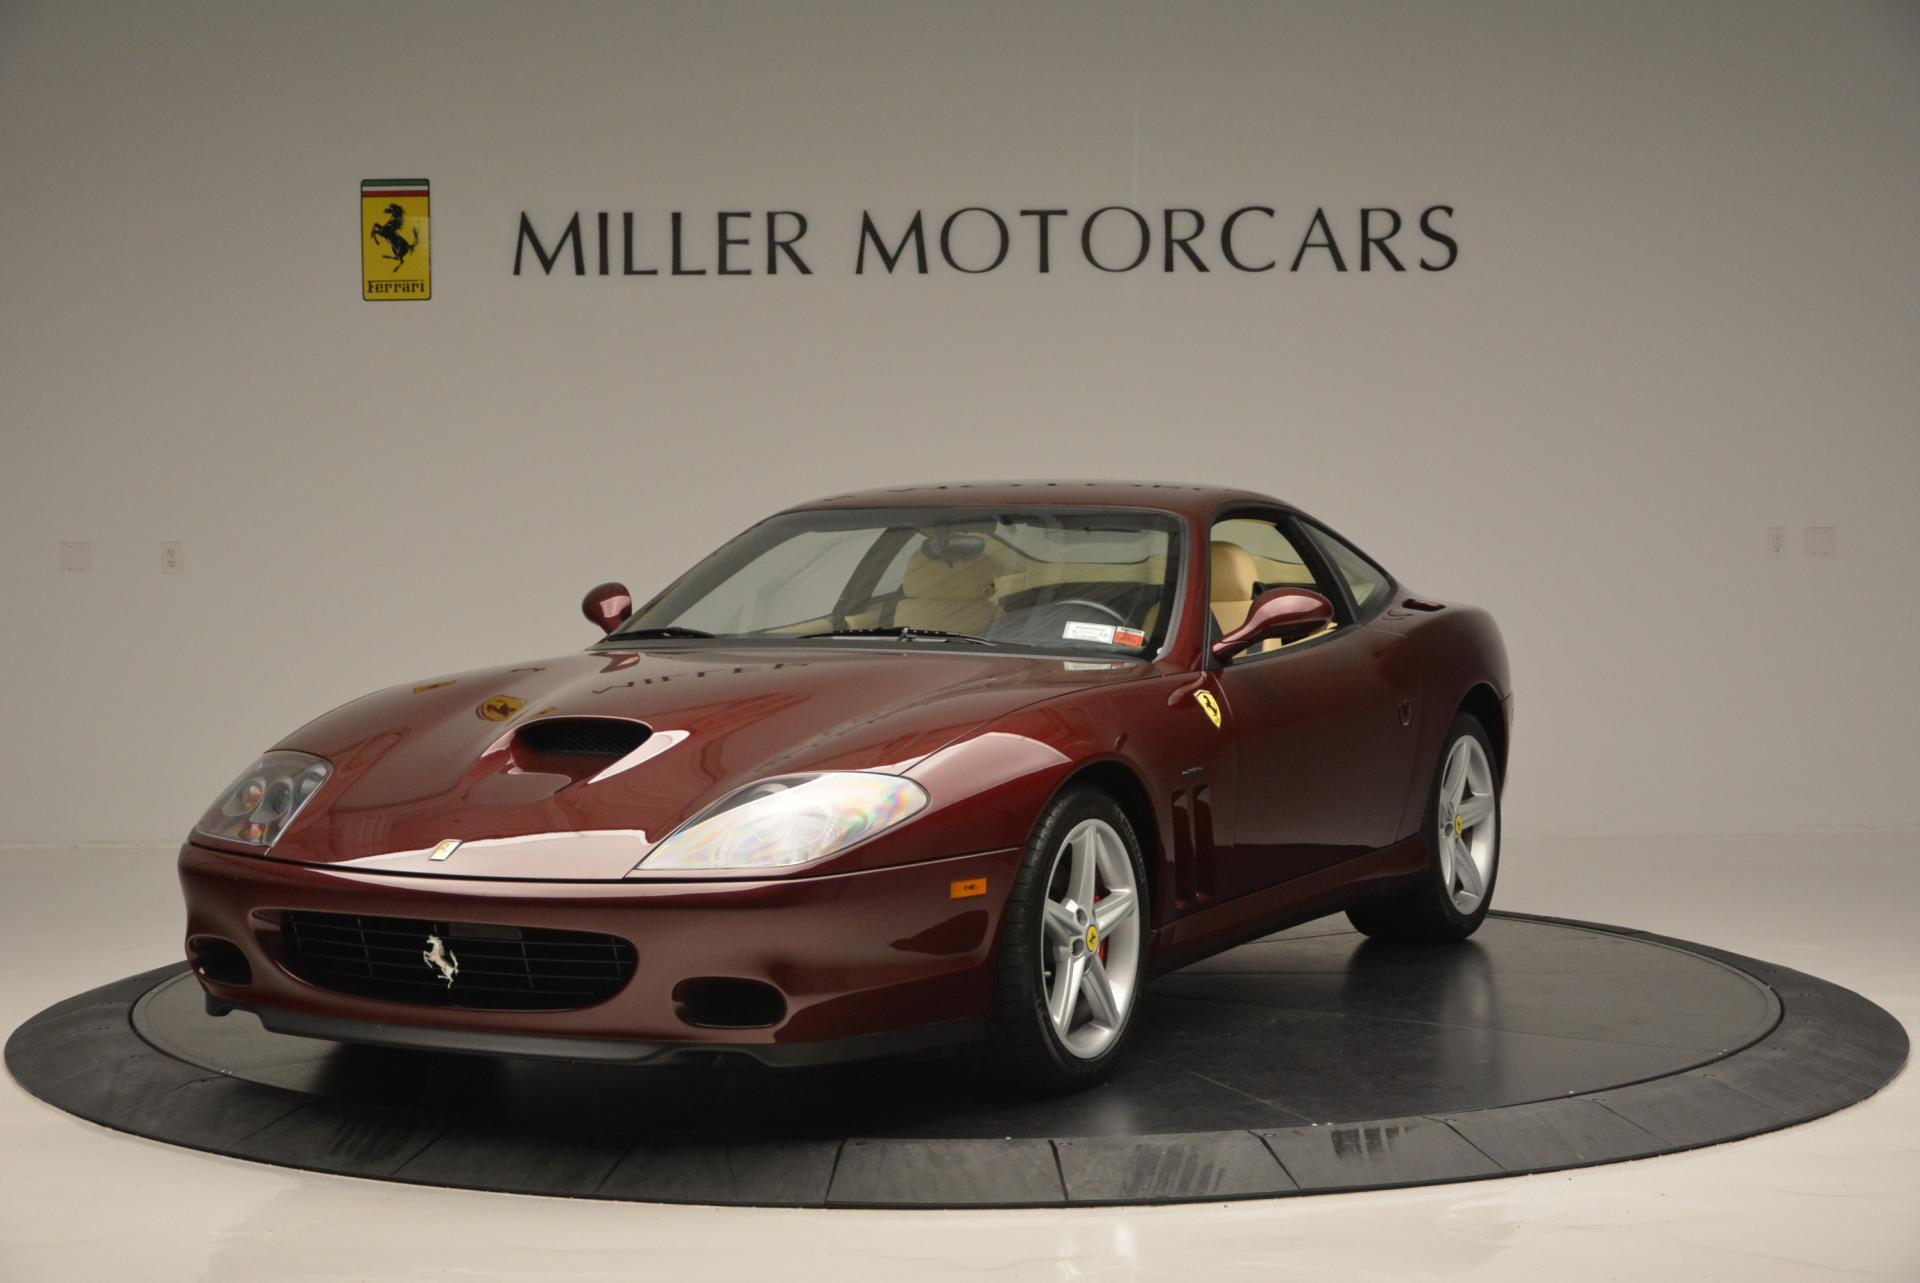 Used 2003 Ferrari 575M Maranello 6-Speed Manual for sale Sold at Maserati of Greenwich in Greenwich CT 06830 1